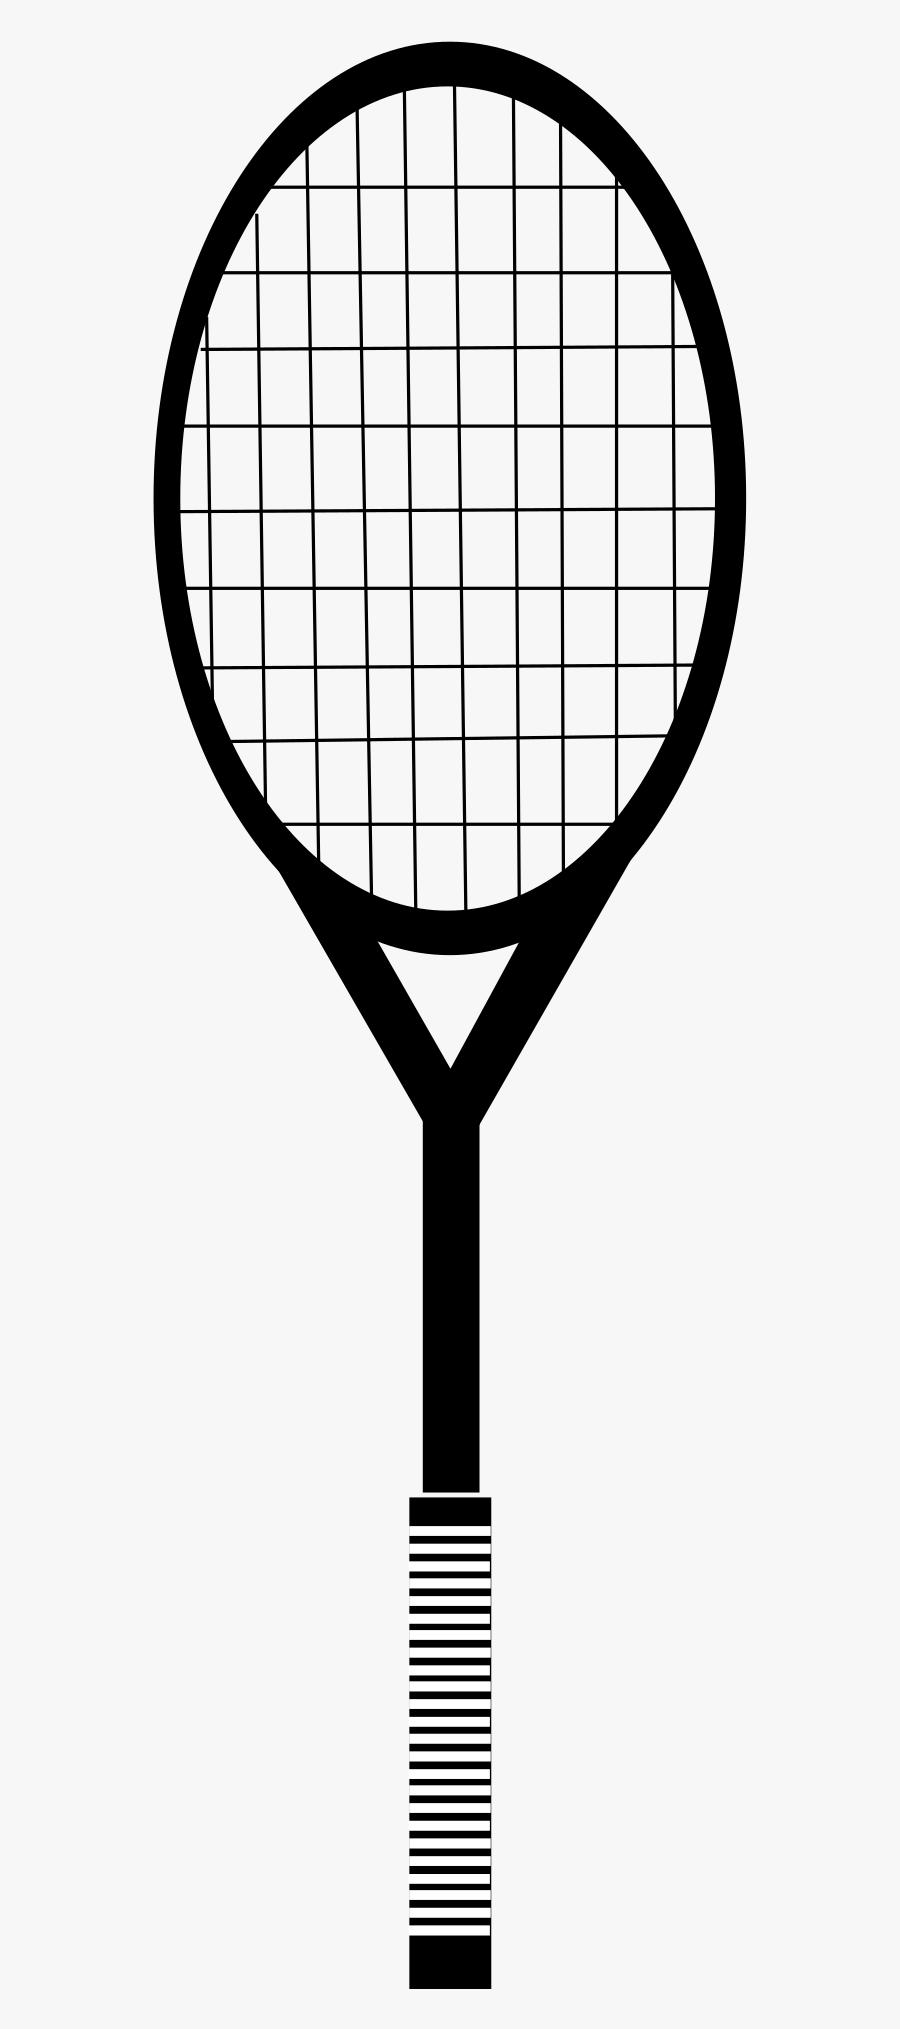 Tennis Racquet Clipart - Small Pics Of Tennis Rackets, Transparent Clipart